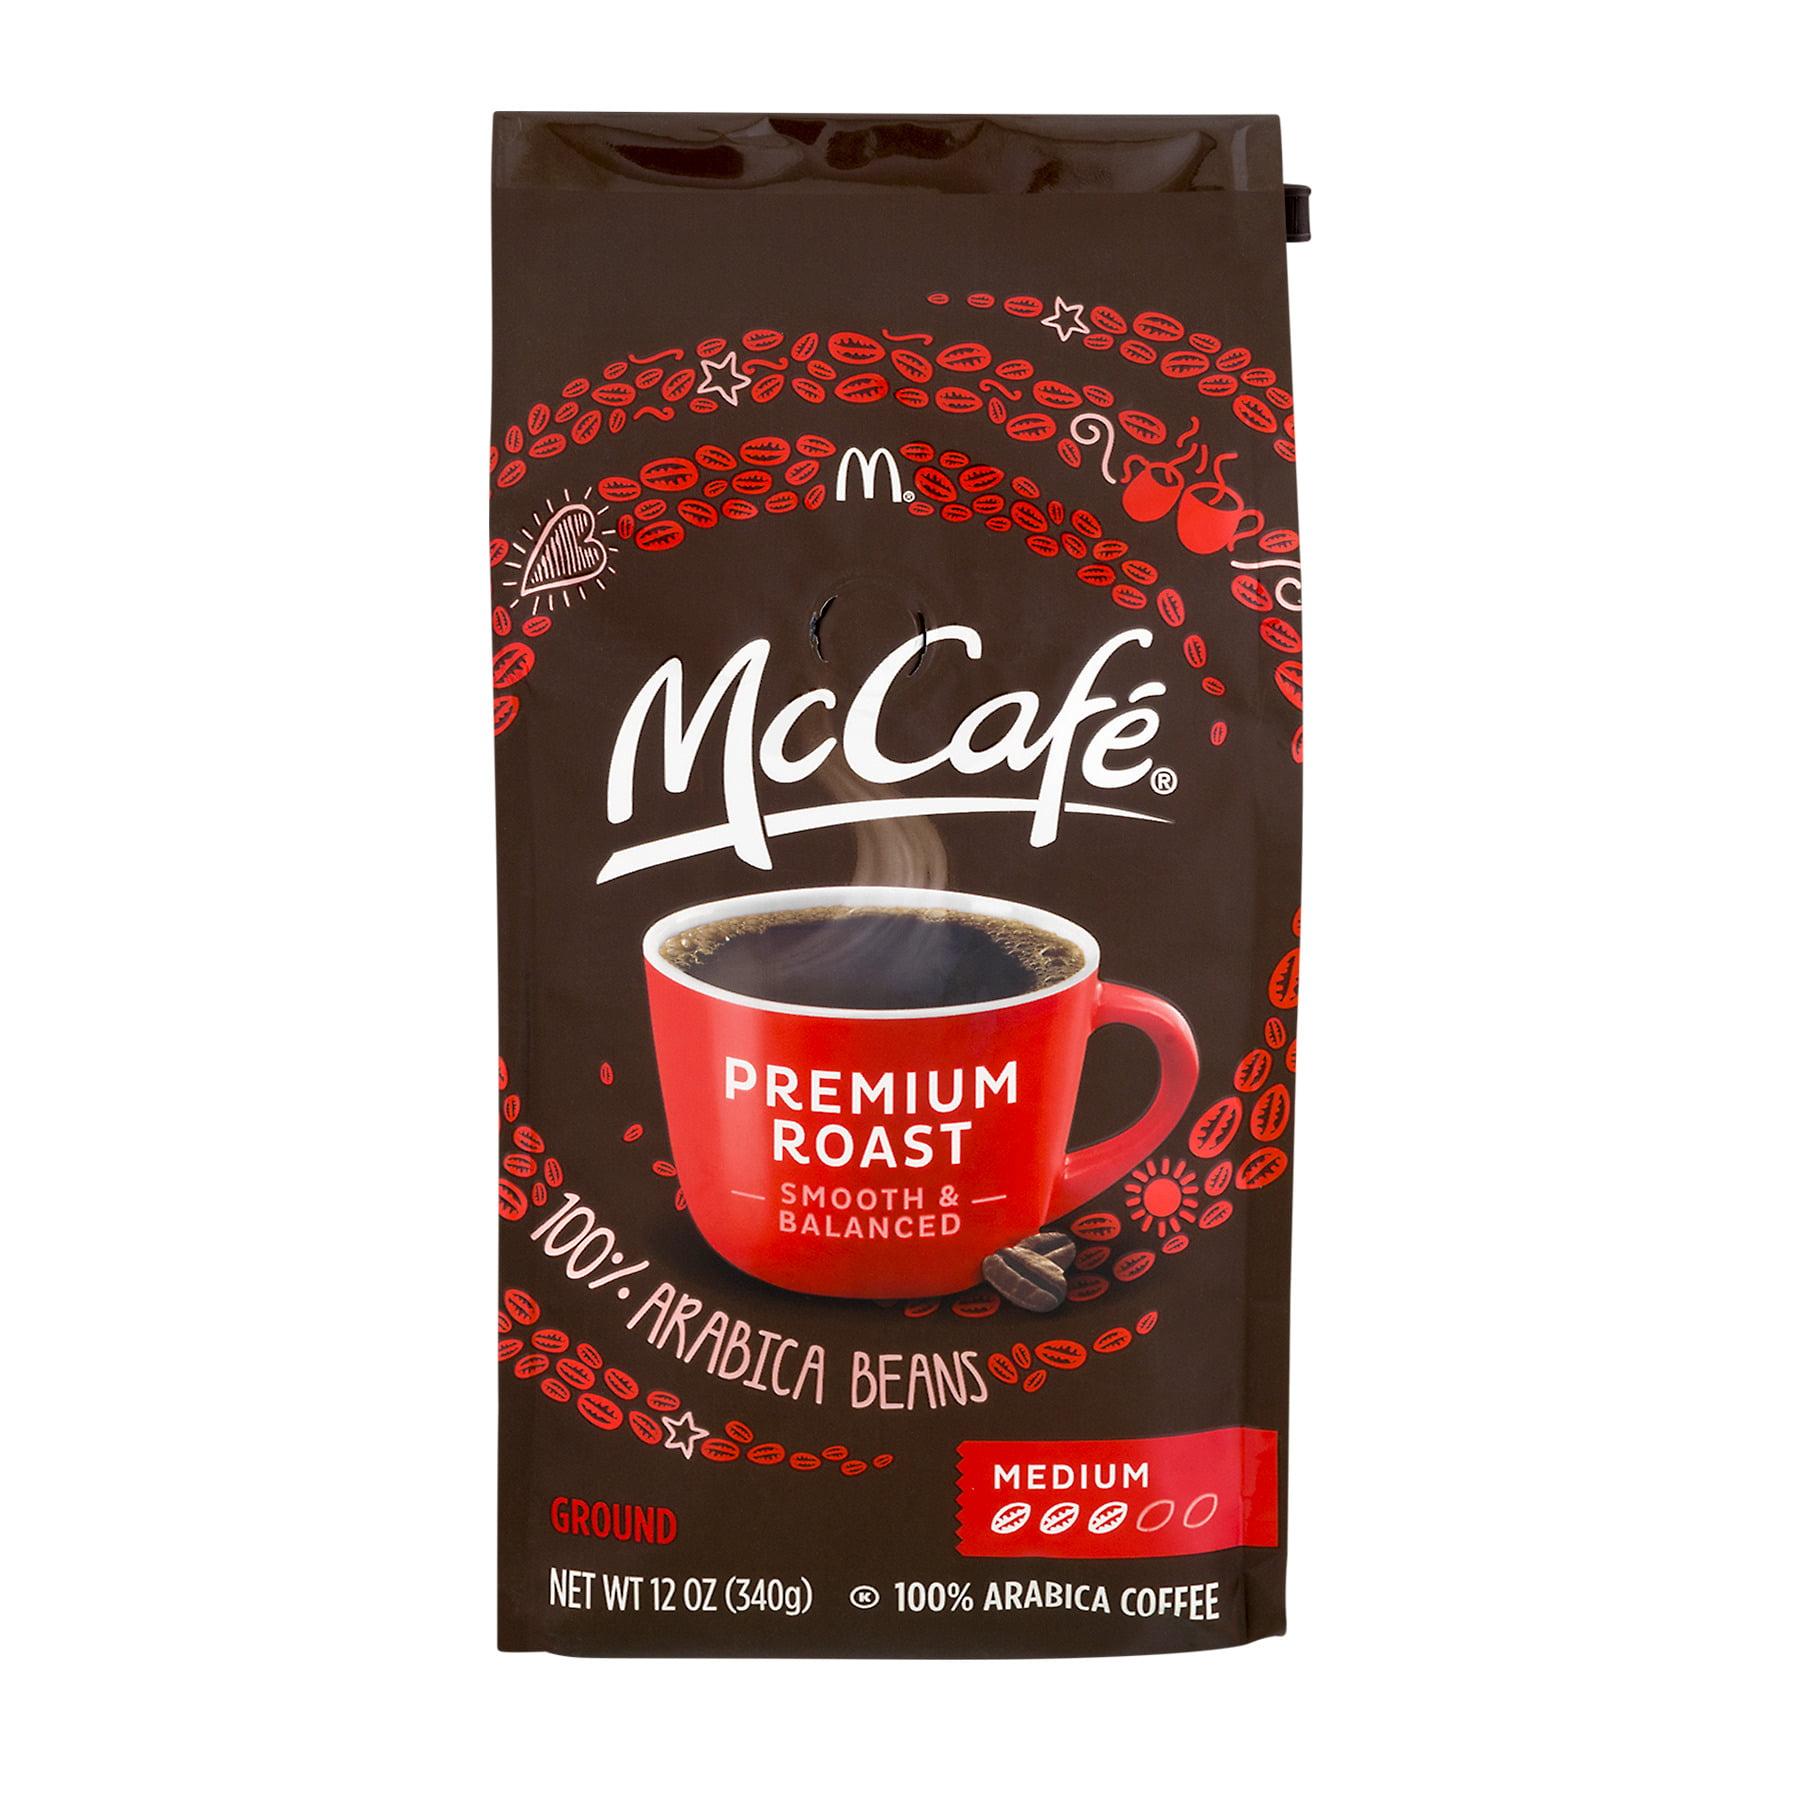 McCafe Premium Roast Ground Coffee Smooth & Balanced Medium, 12.0 OZ